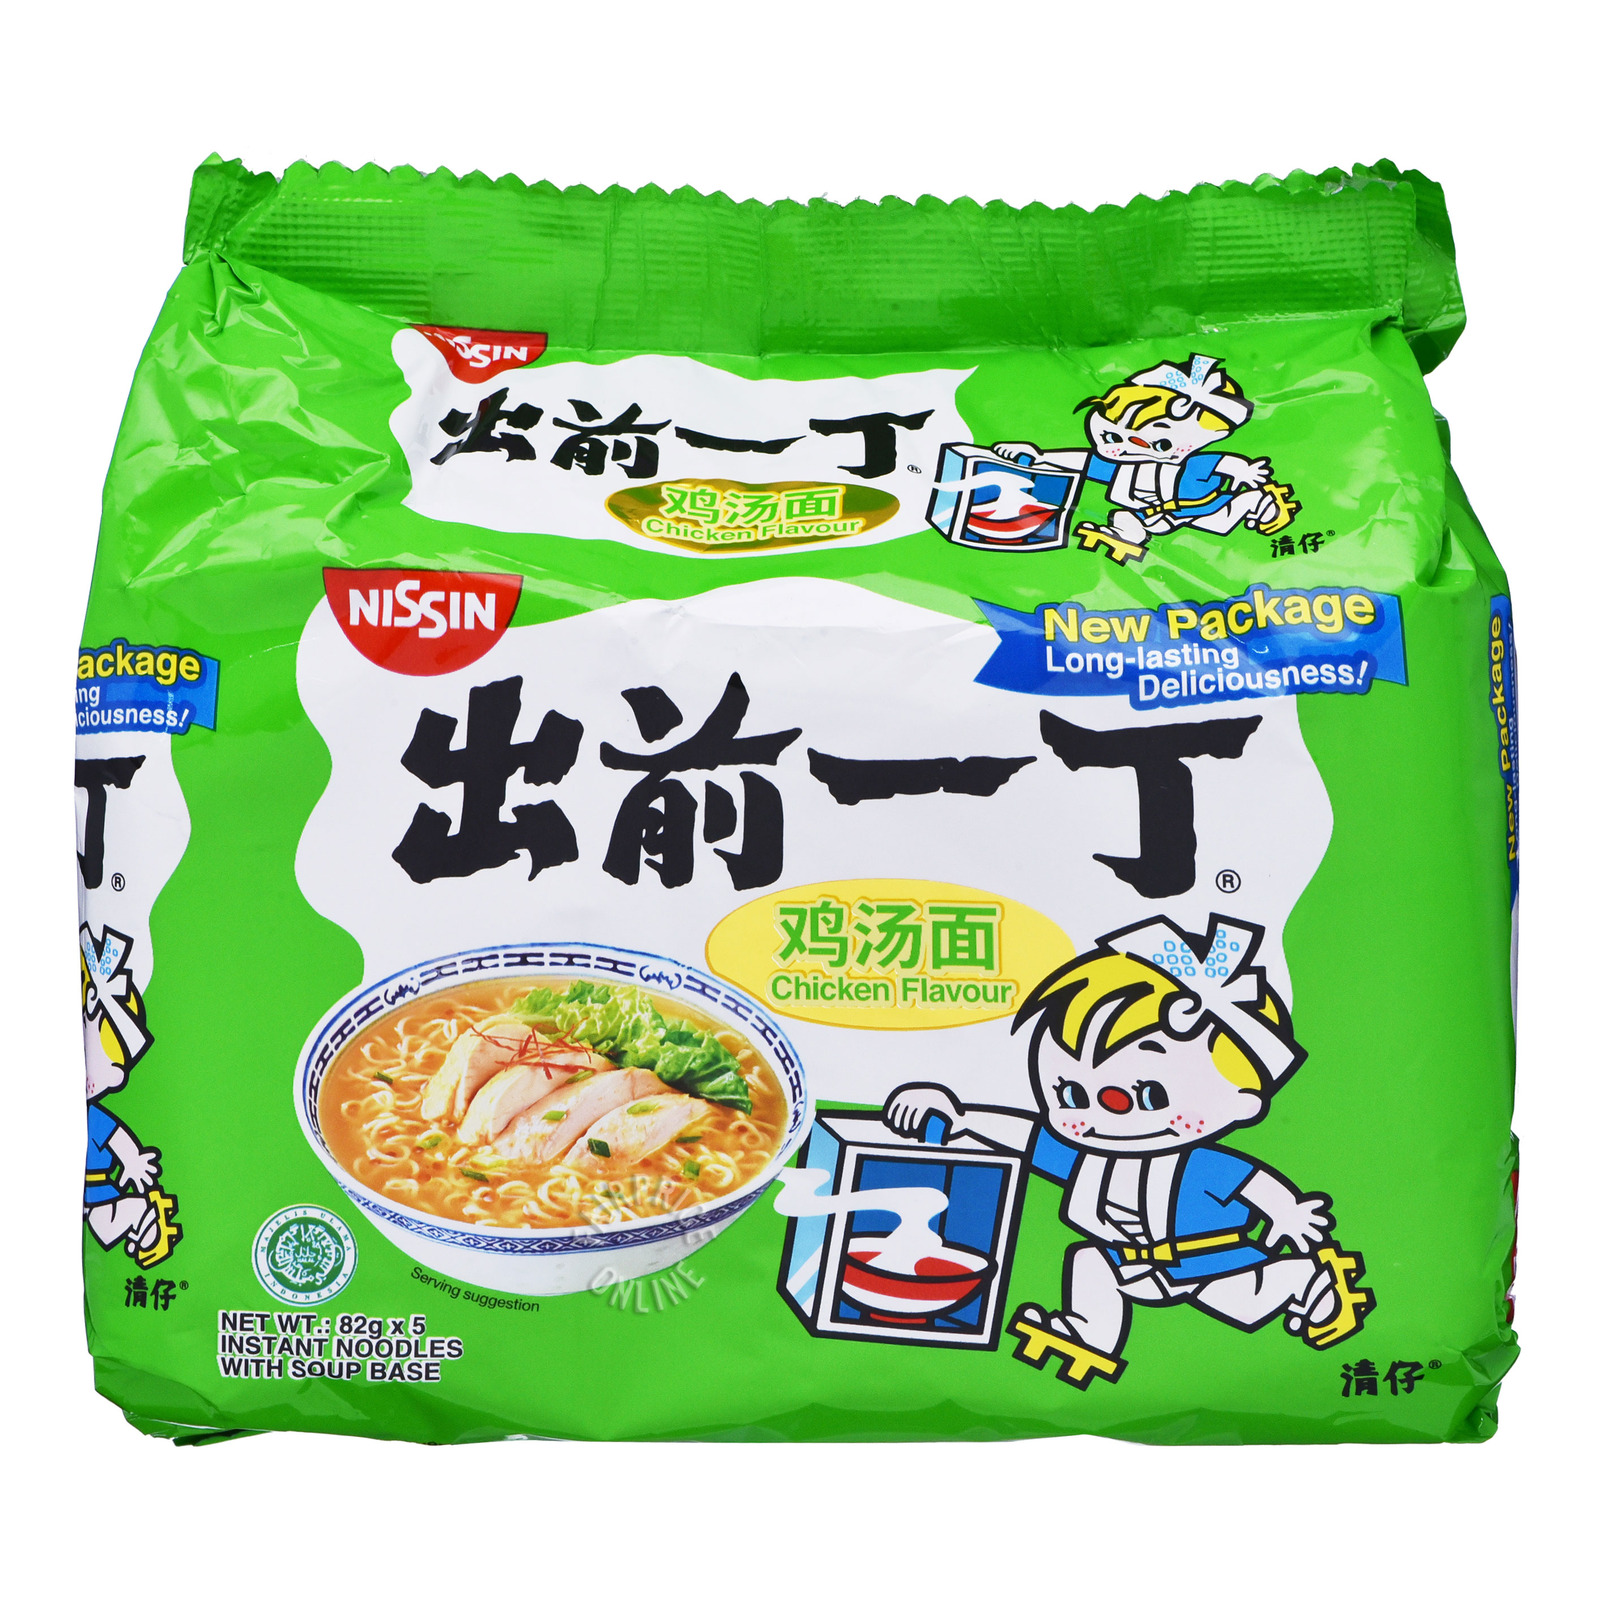 Nissin Instant Noodles - Chicken